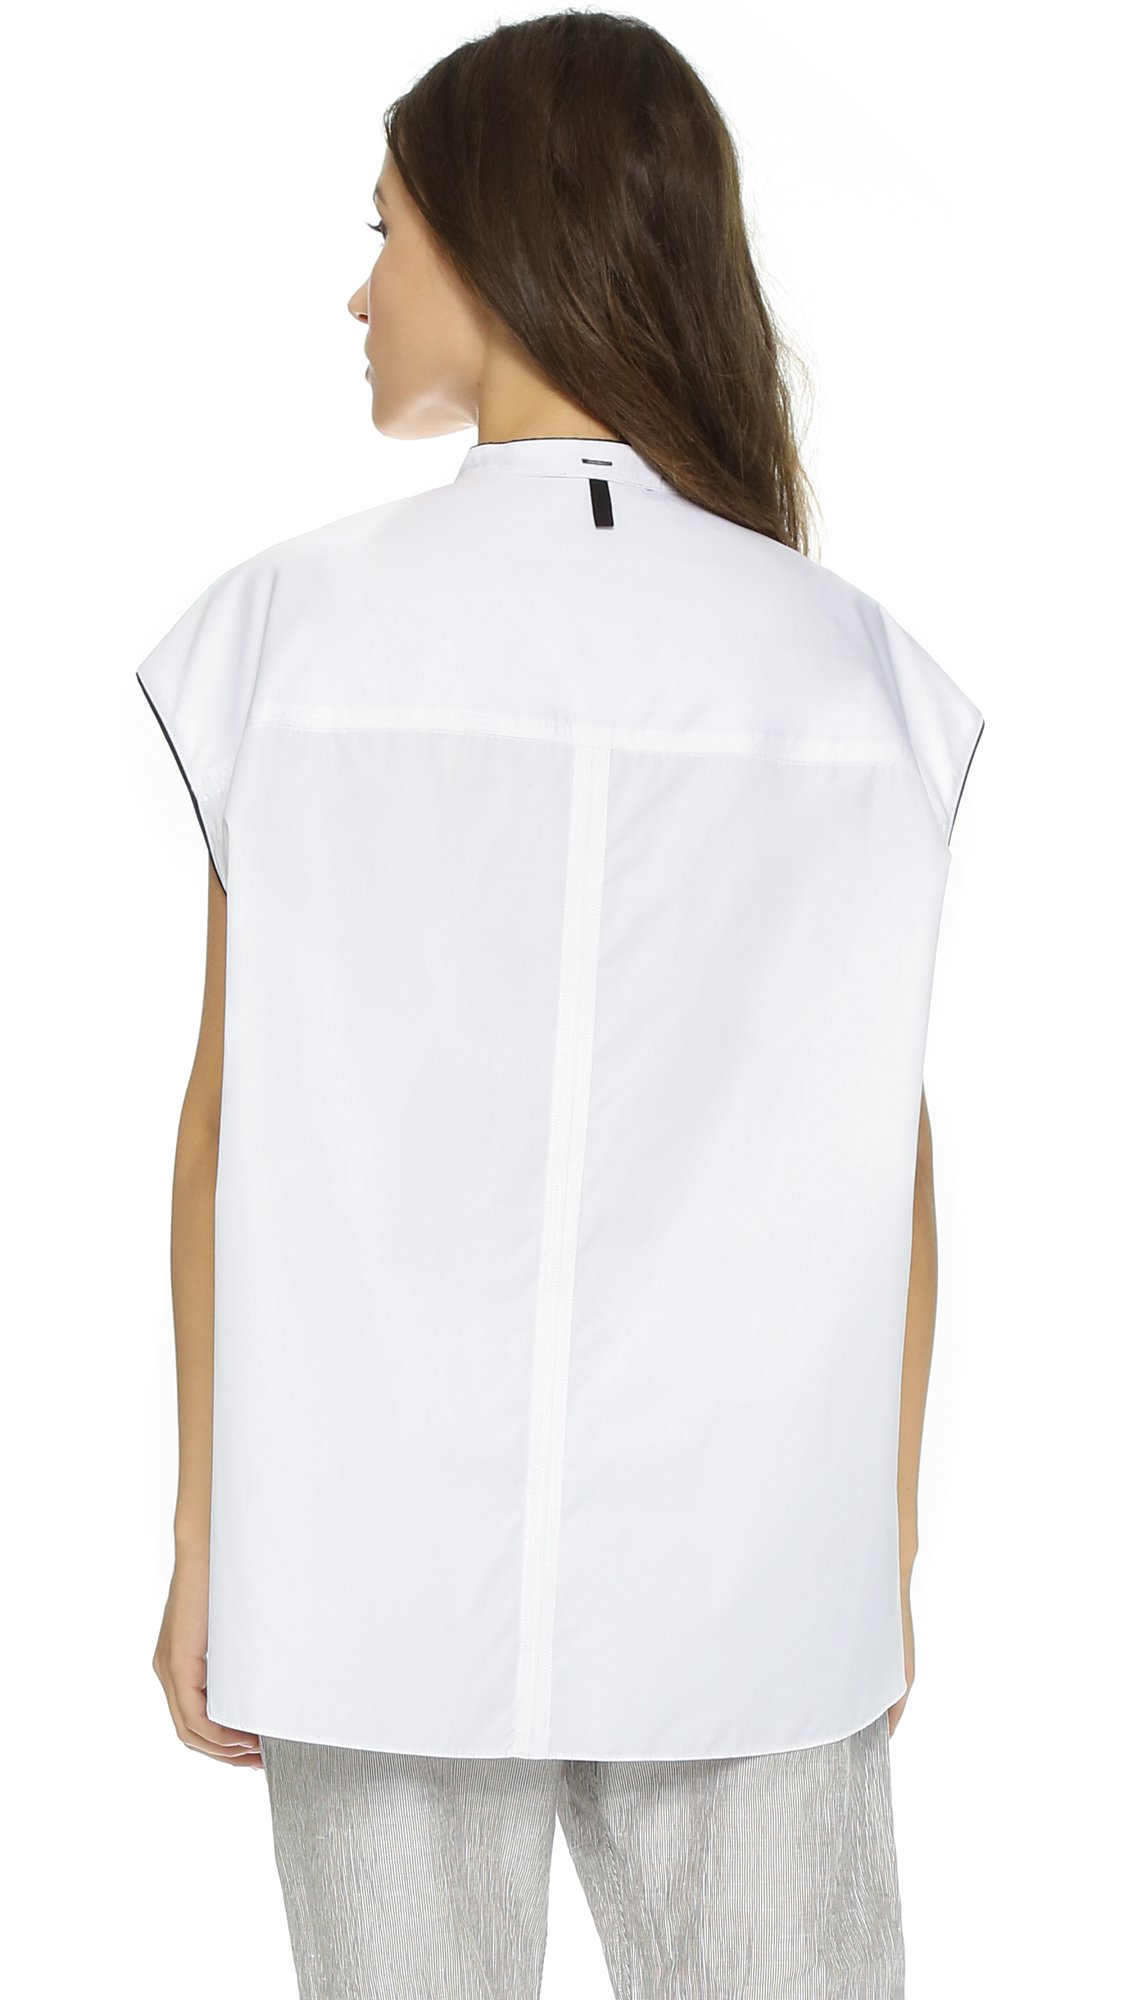 Lyst rag bone manon shirt white in white for Rag bone shirt